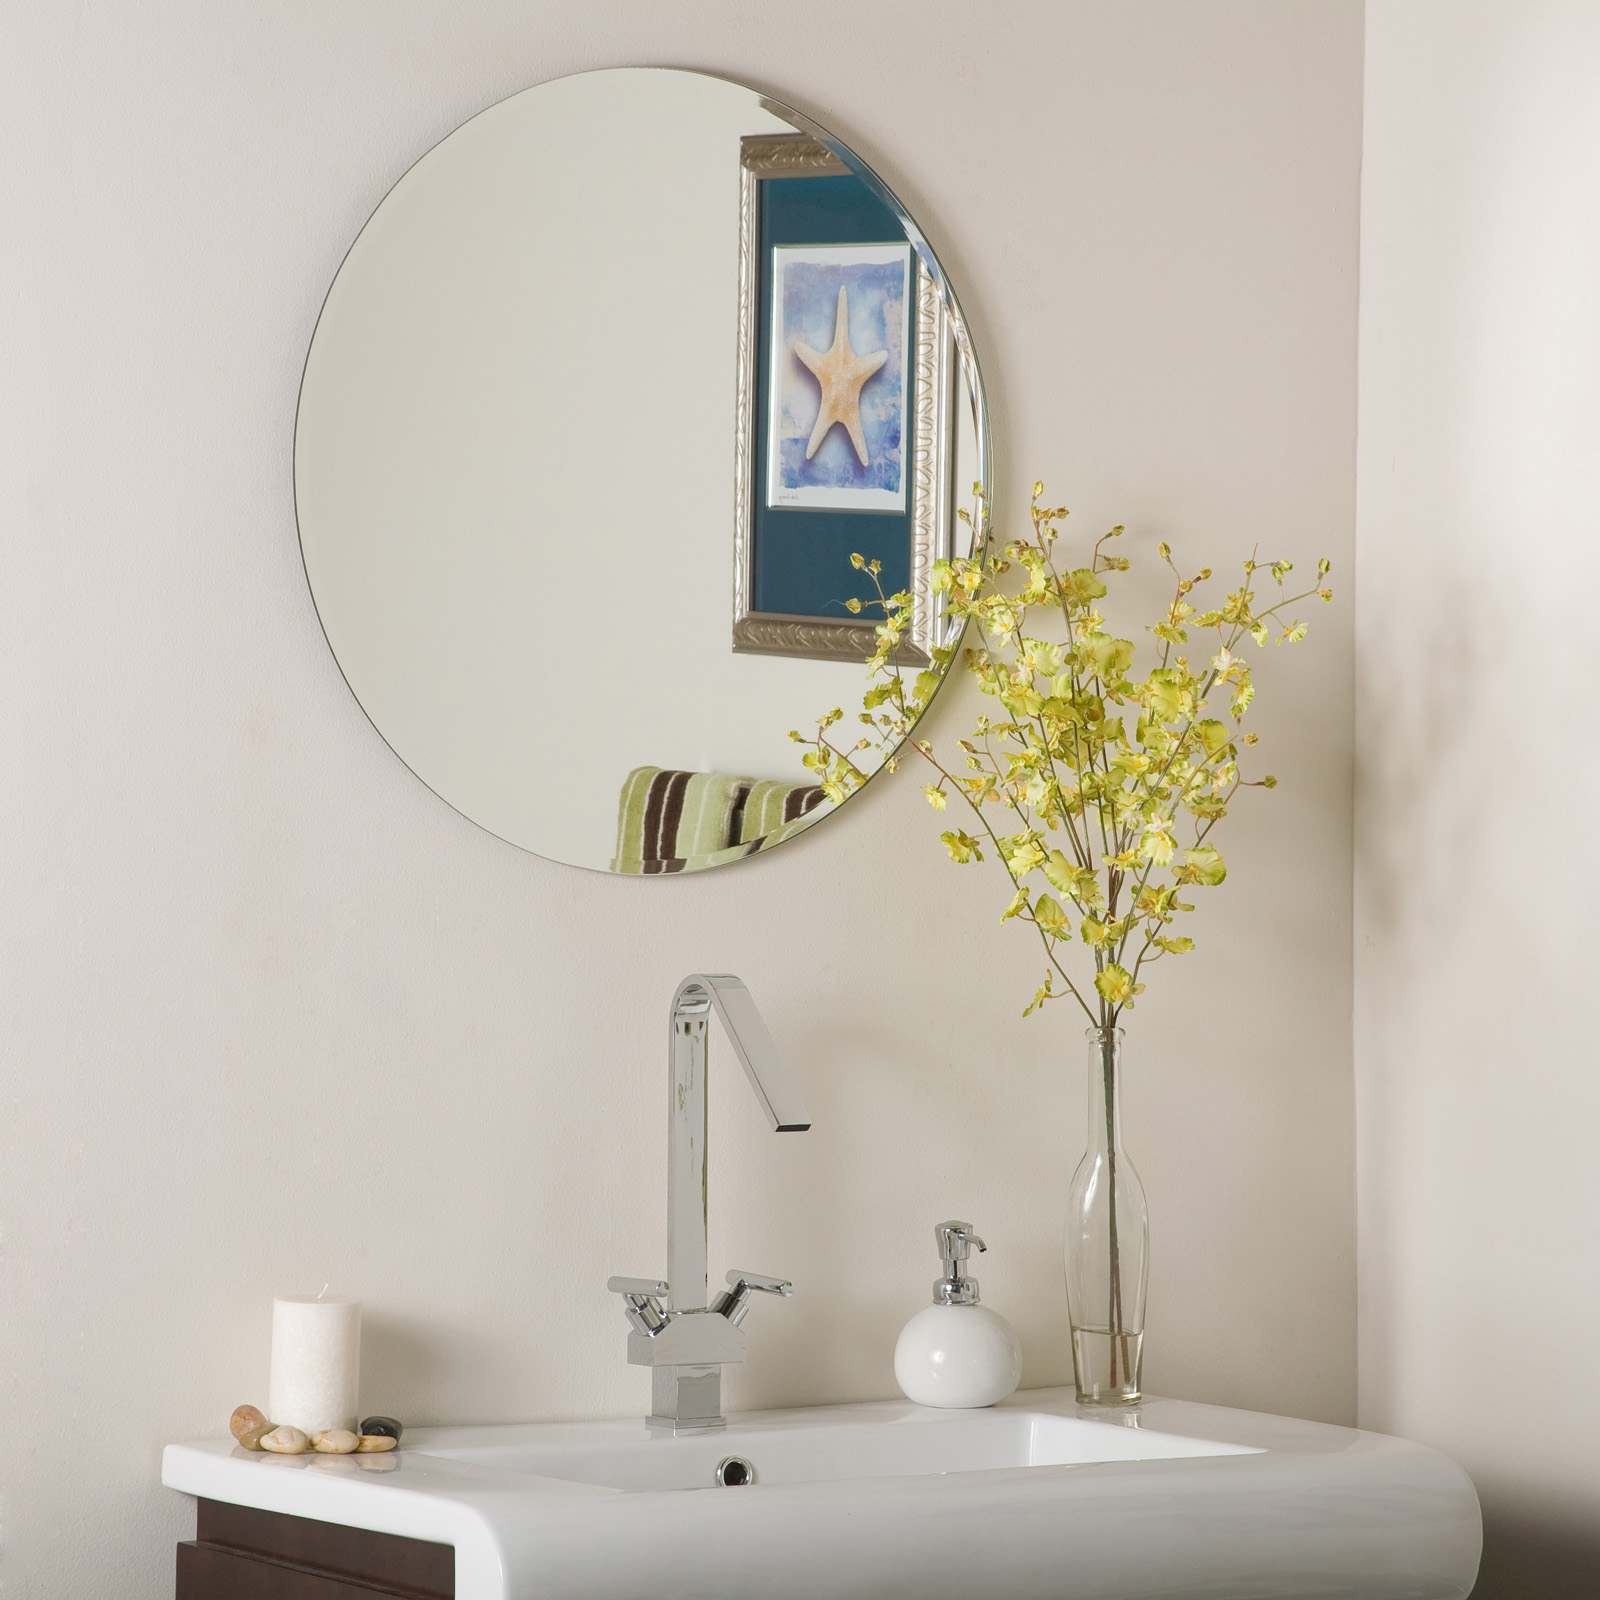 Beveled Bathroom Vanity Mirrors. Bathroom Frameless, Frameless Round Beveled  Mirror Vanity Mirrors R